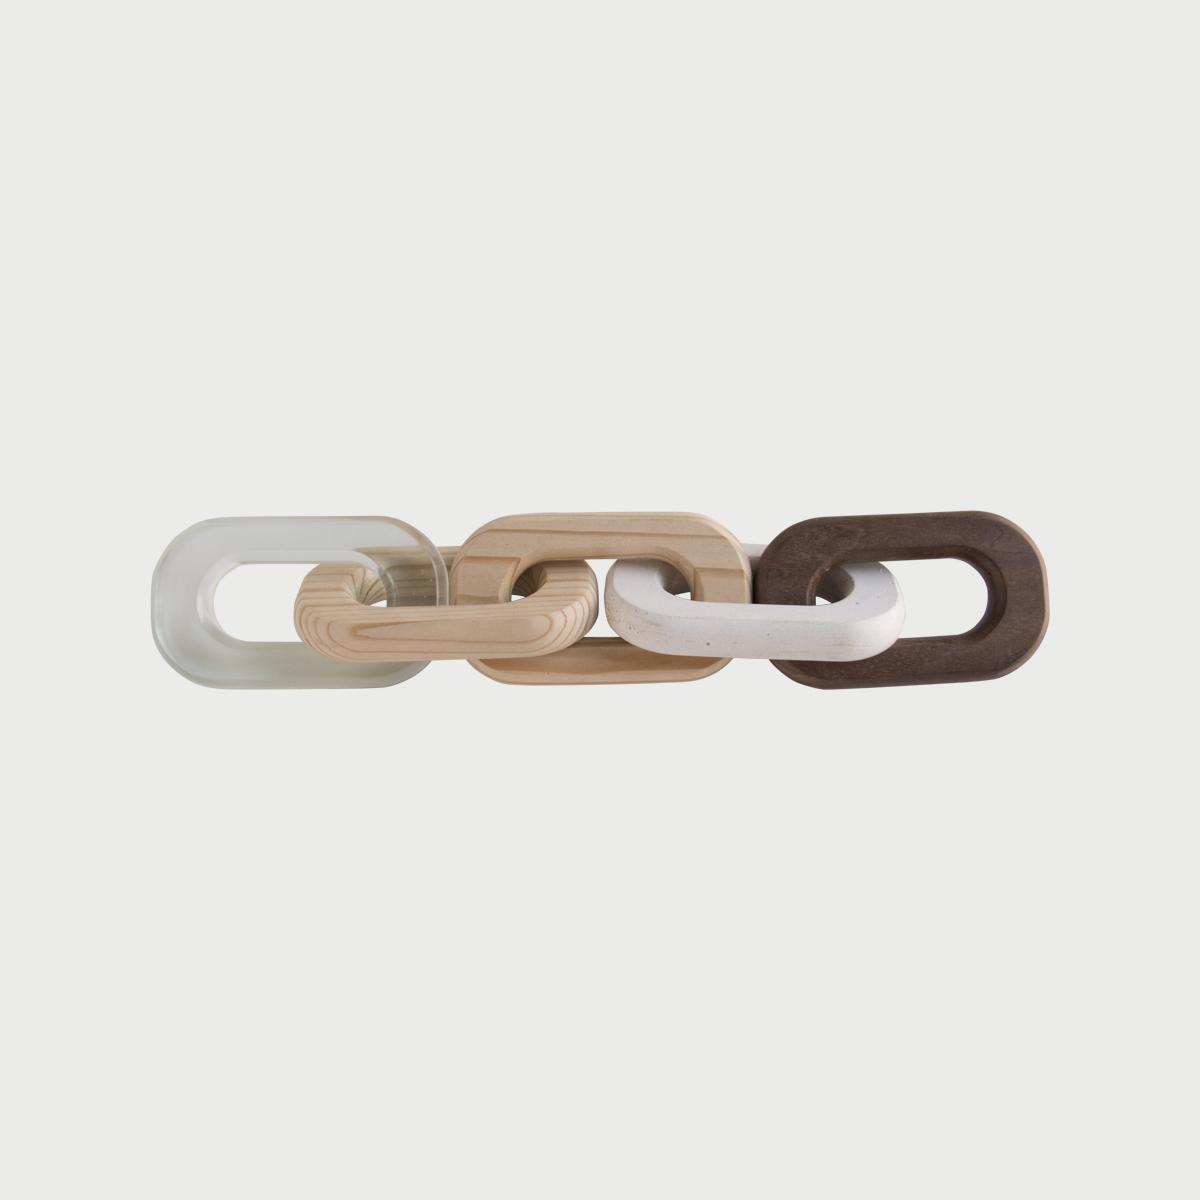 Copy of Links Walnut / Fir / Concrete / Resin